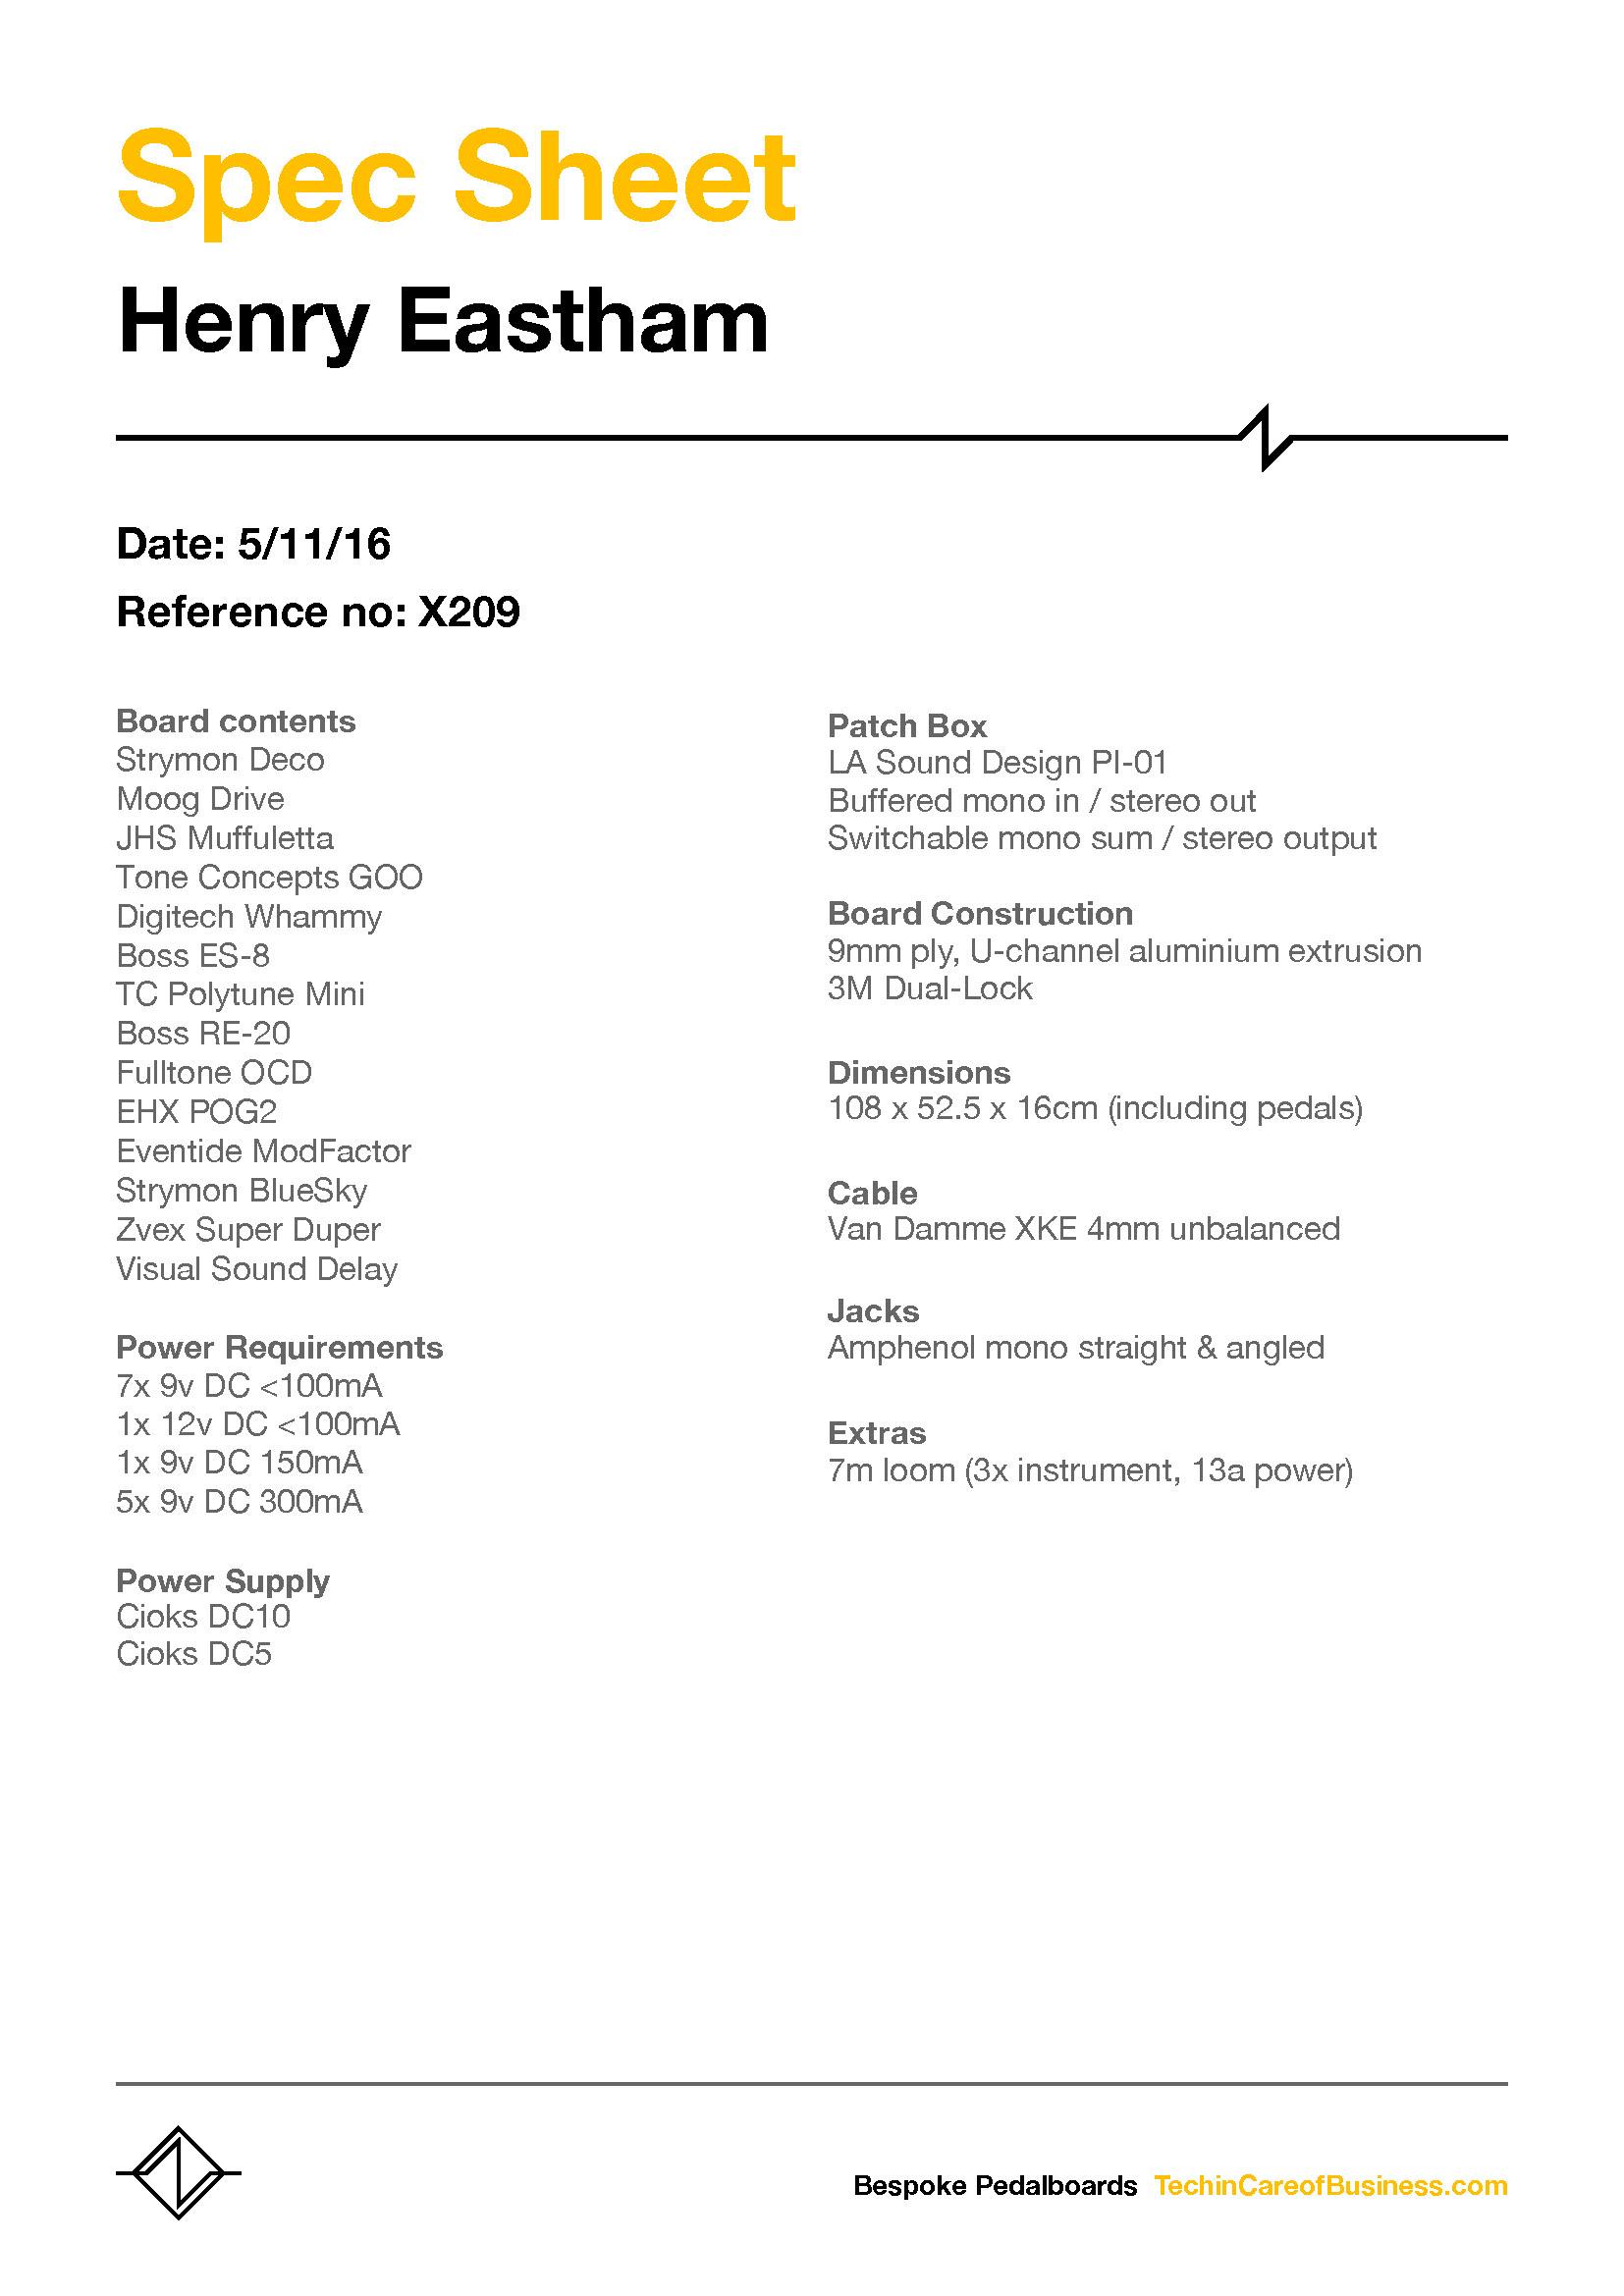 HE Spec sheet.jpg